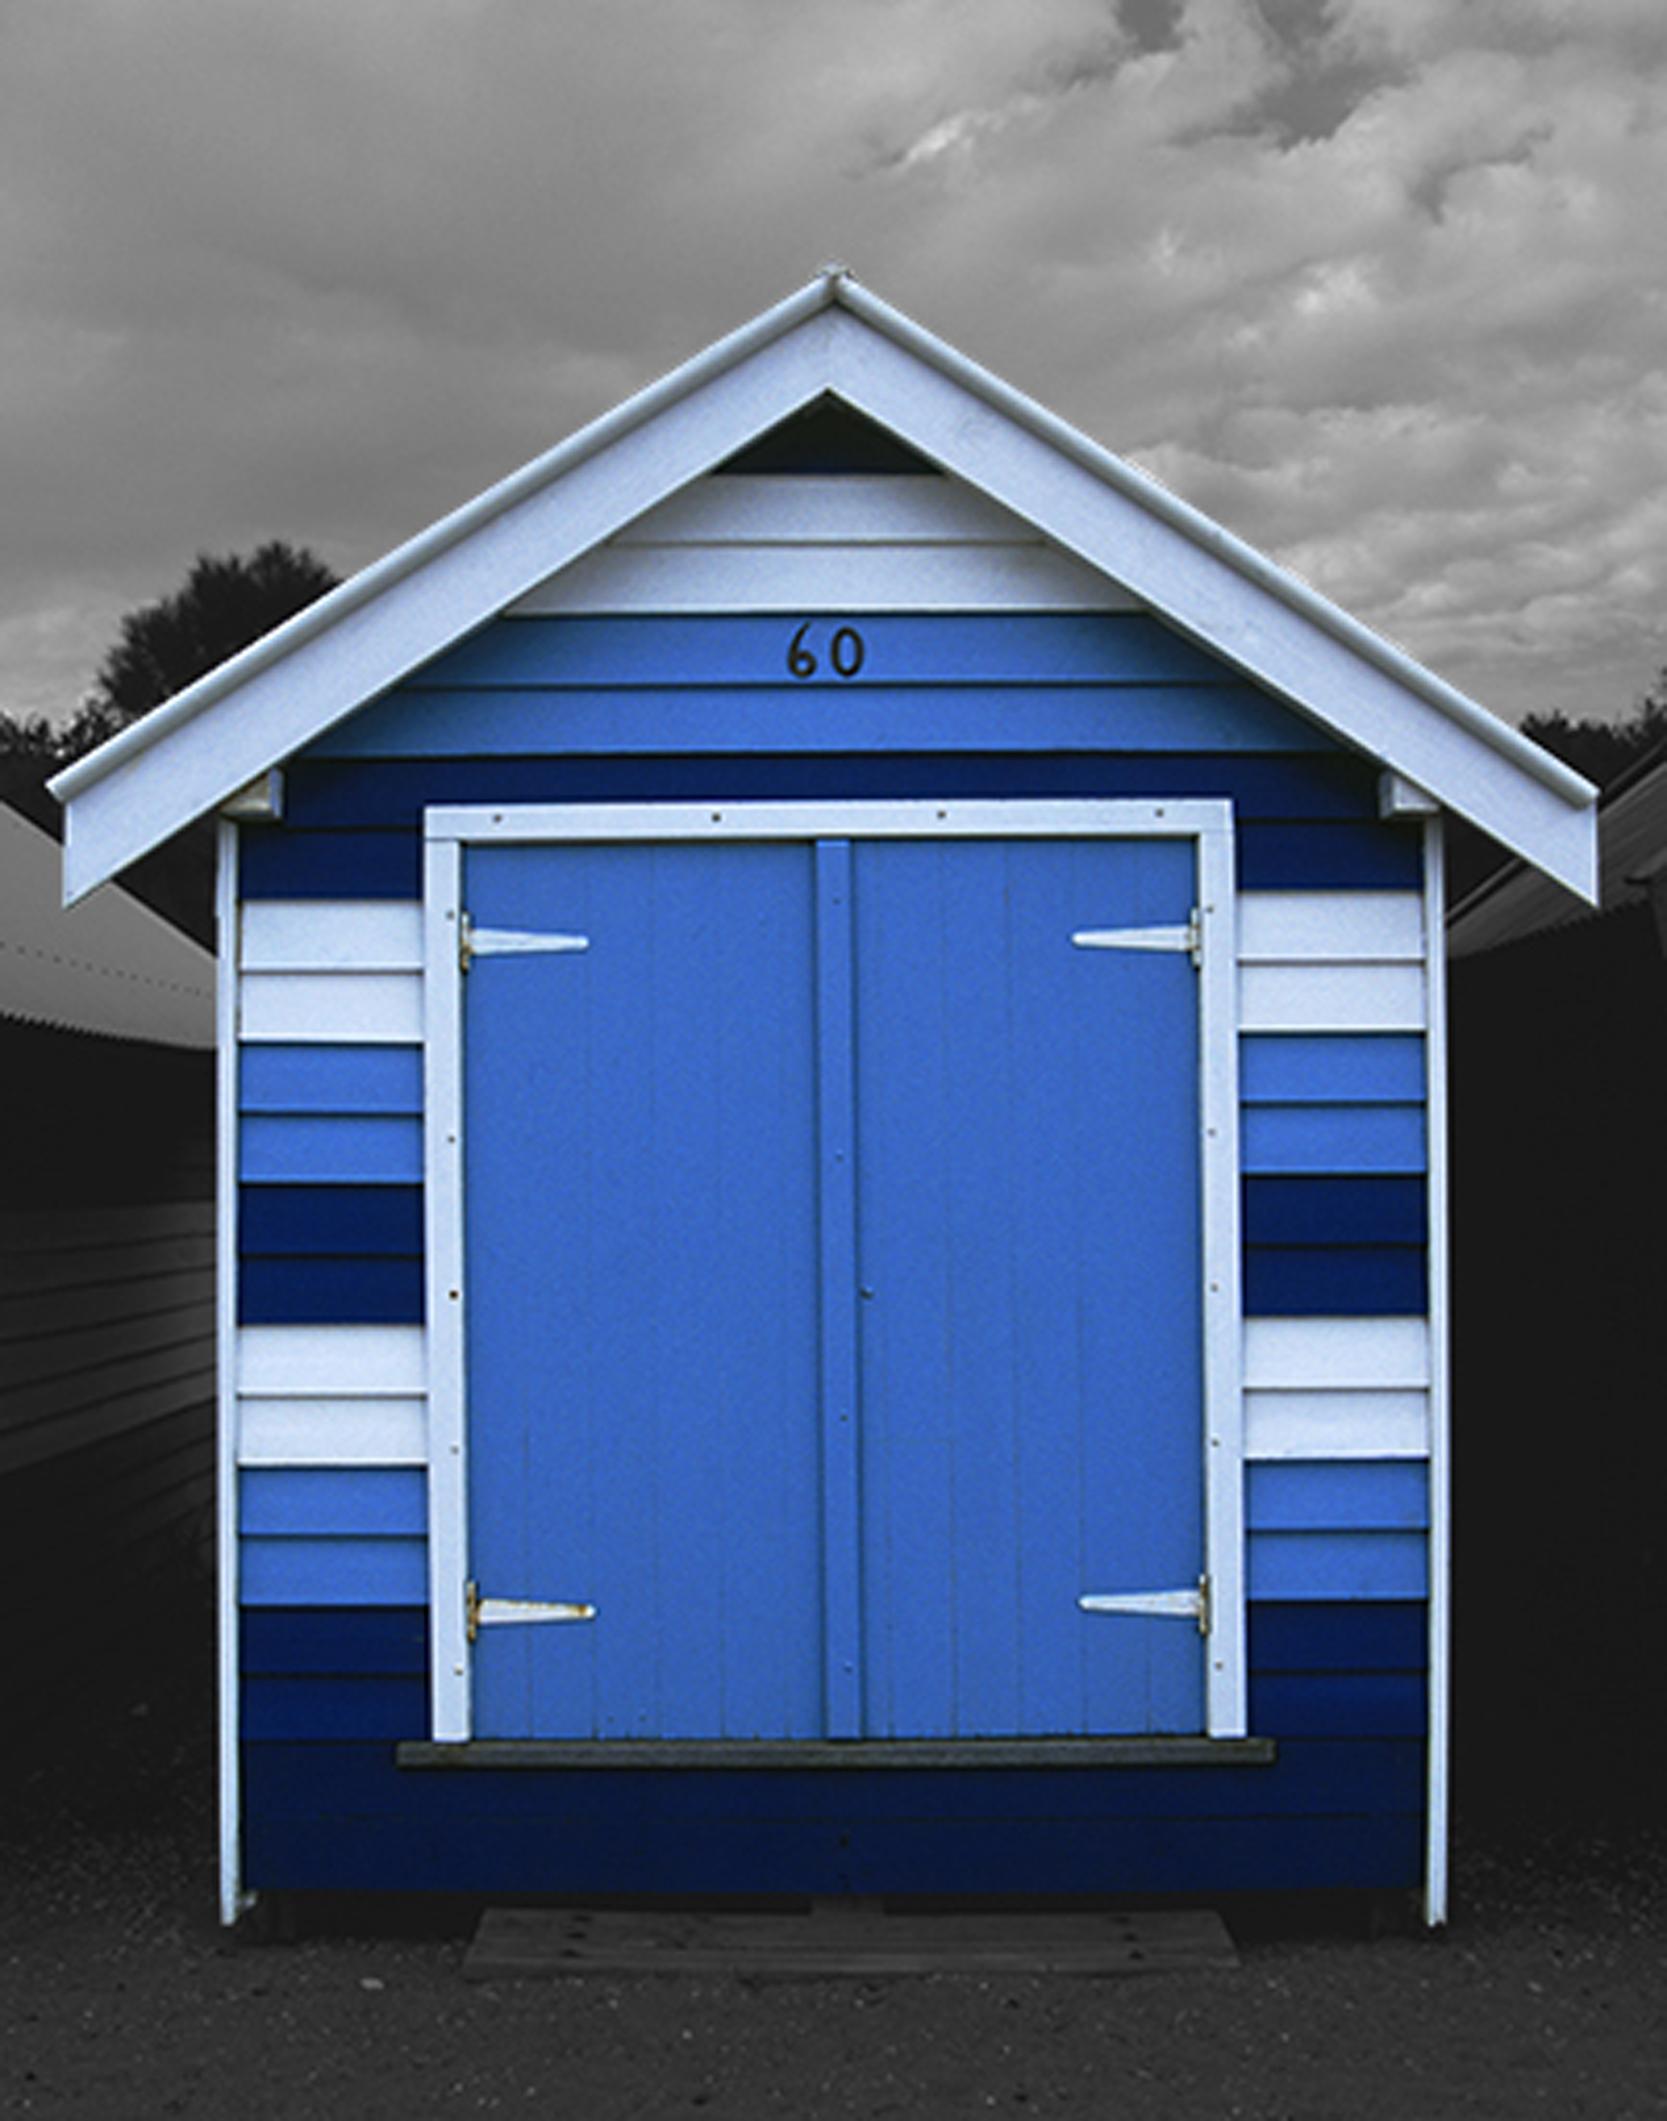 Beach Box #60, 20 x 16 inches / 50 x 40 cm, archival pigment print, edition of 15, 2003